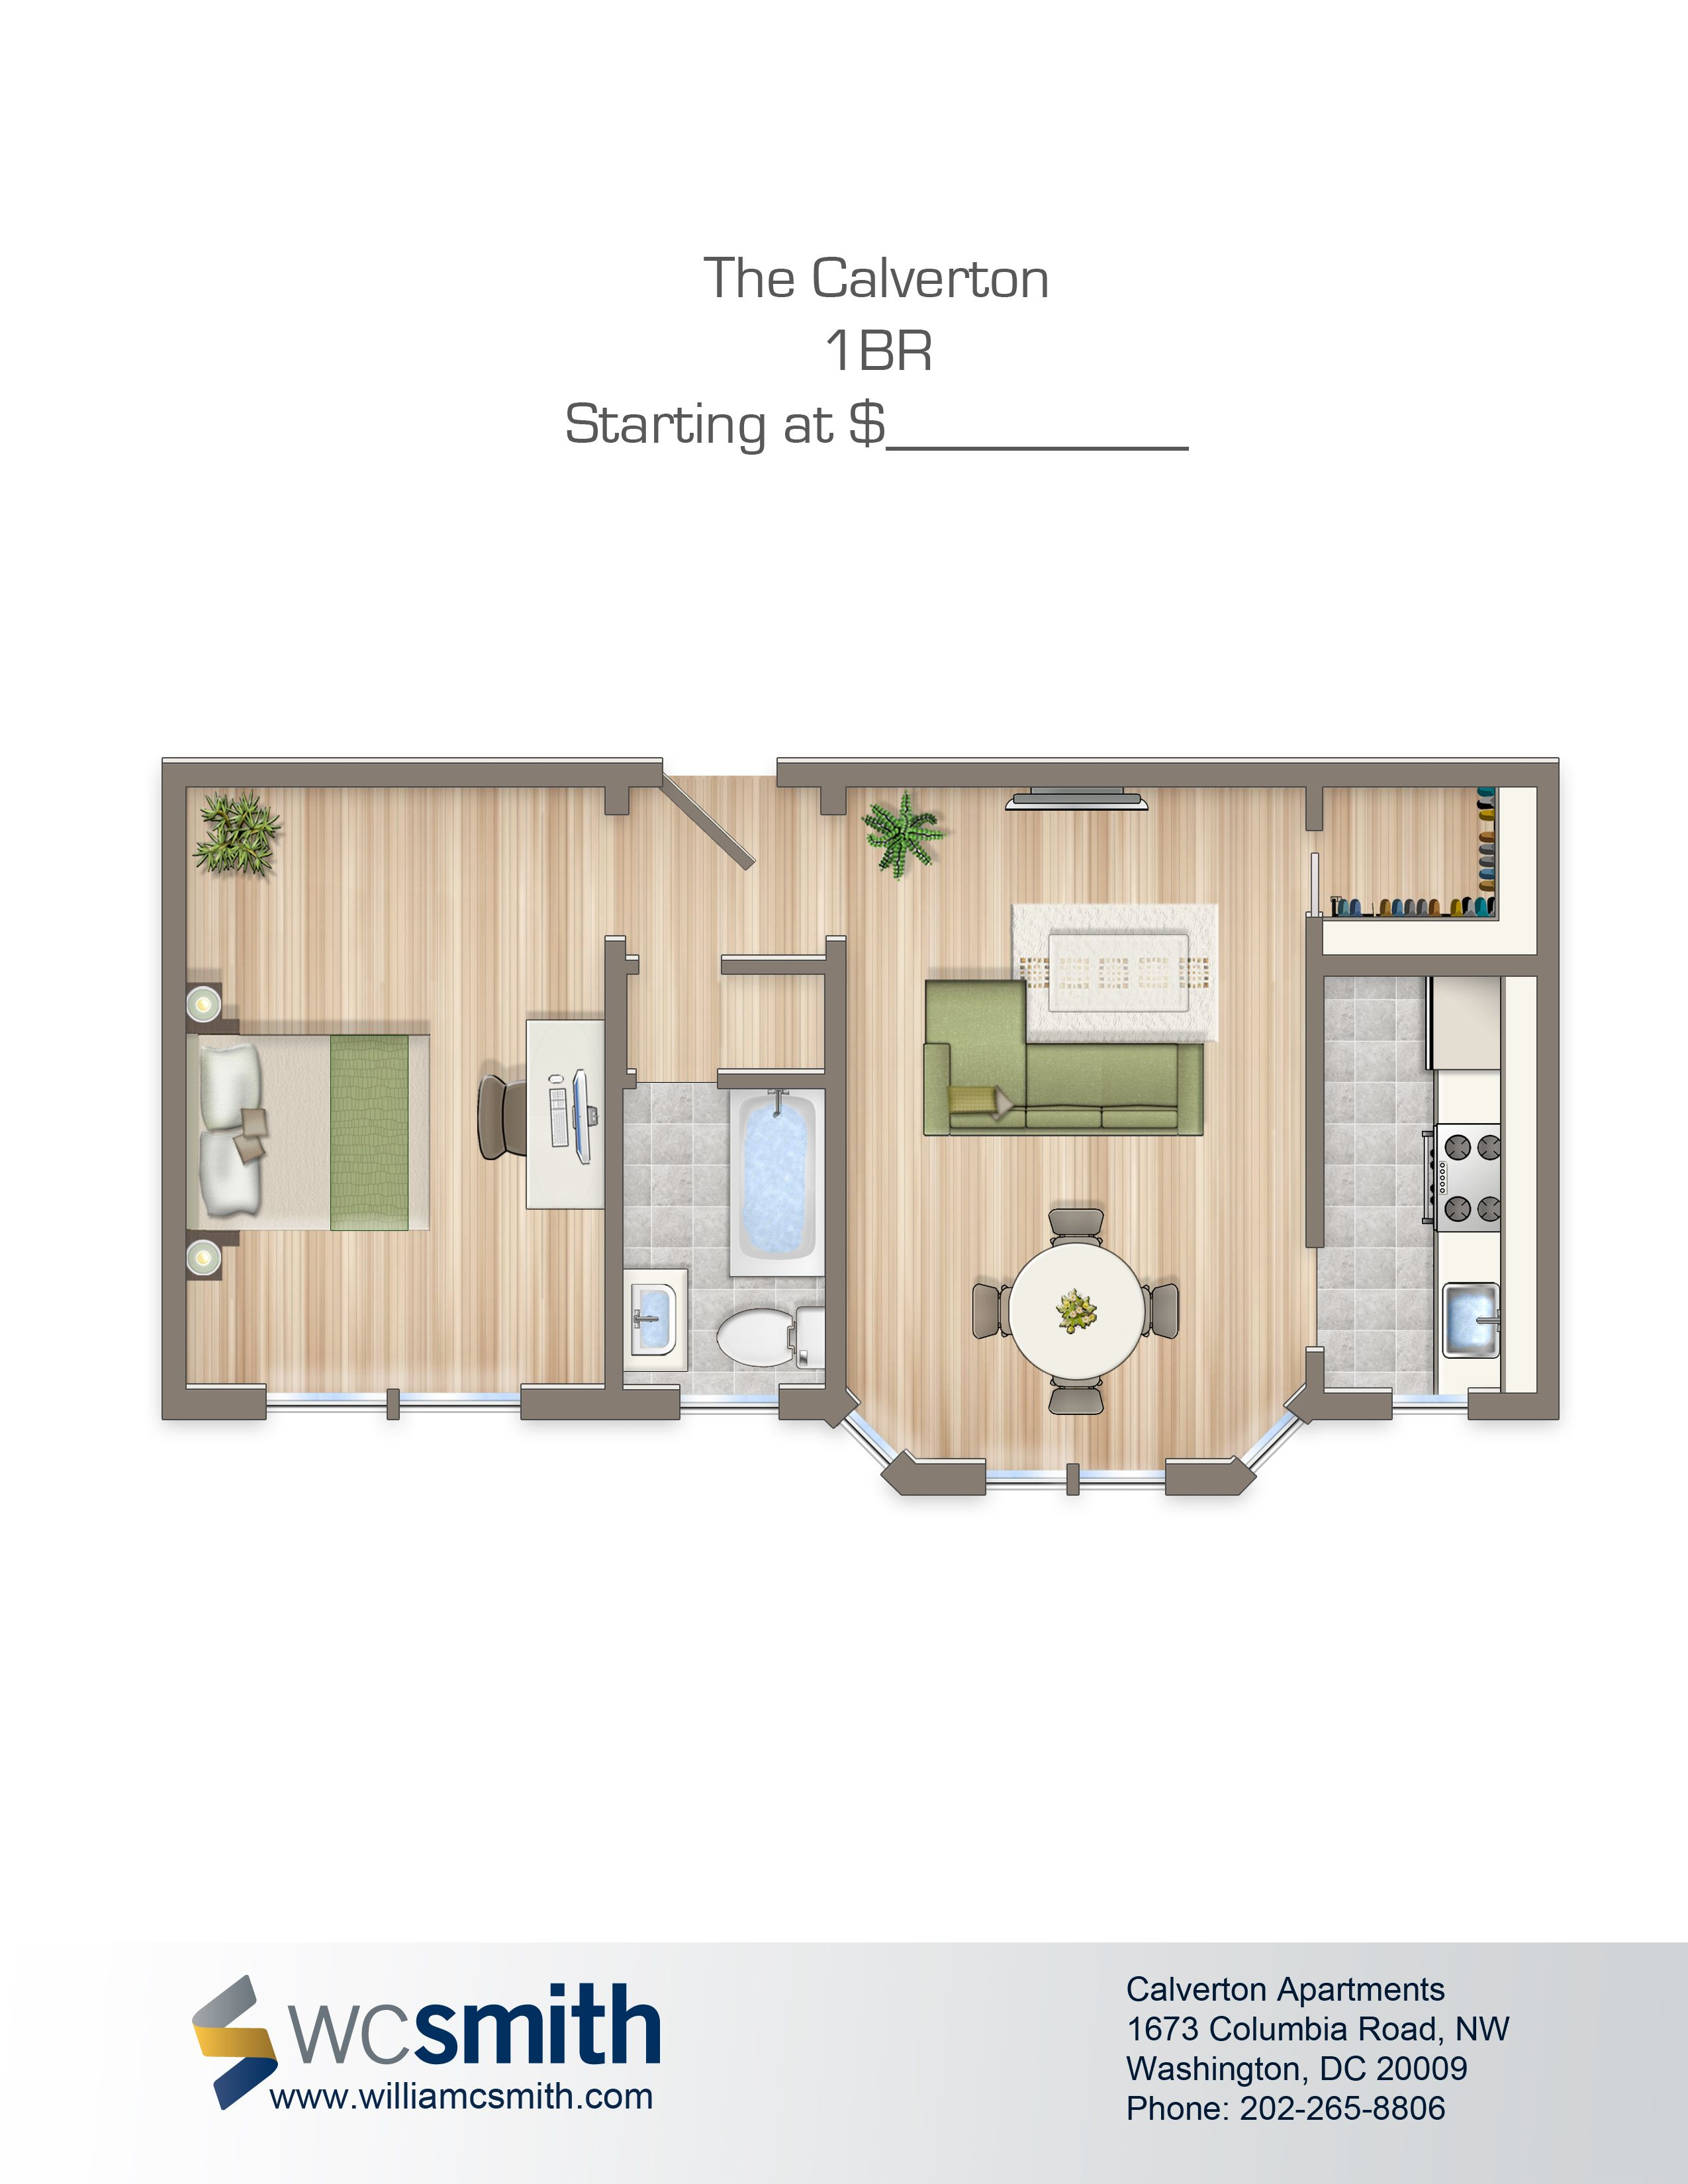 One bedroom floorplan available for rent the calverton - 1 bedroom apartments washington dc ...